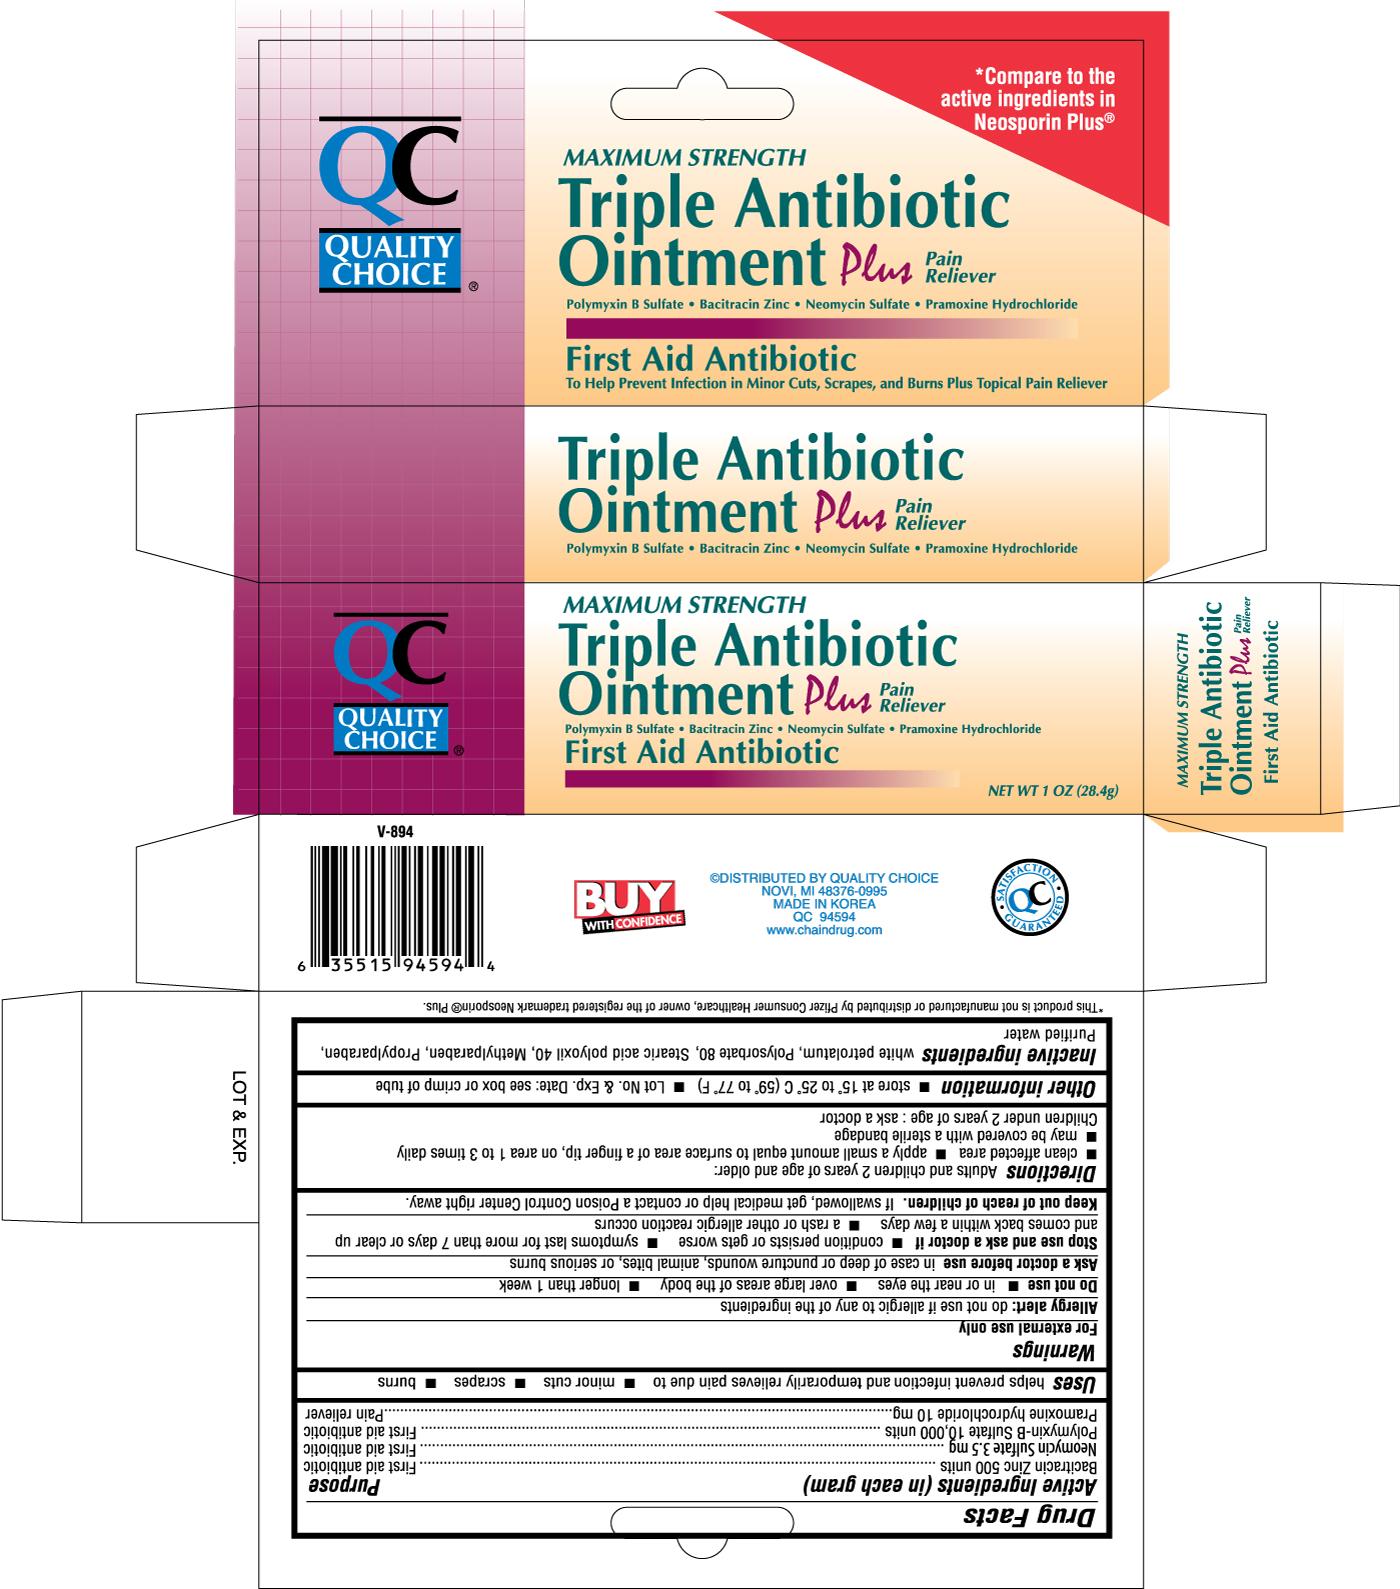 Quality Choice Triple Antibiotic Plus Pain Reliever (Bacitracin Zinc, Neomycin Sulfate, Polymyxin-b Sulfate, Pramoxine Hydrochloride) Ointment [Chain Drug Marketing Association Inc]